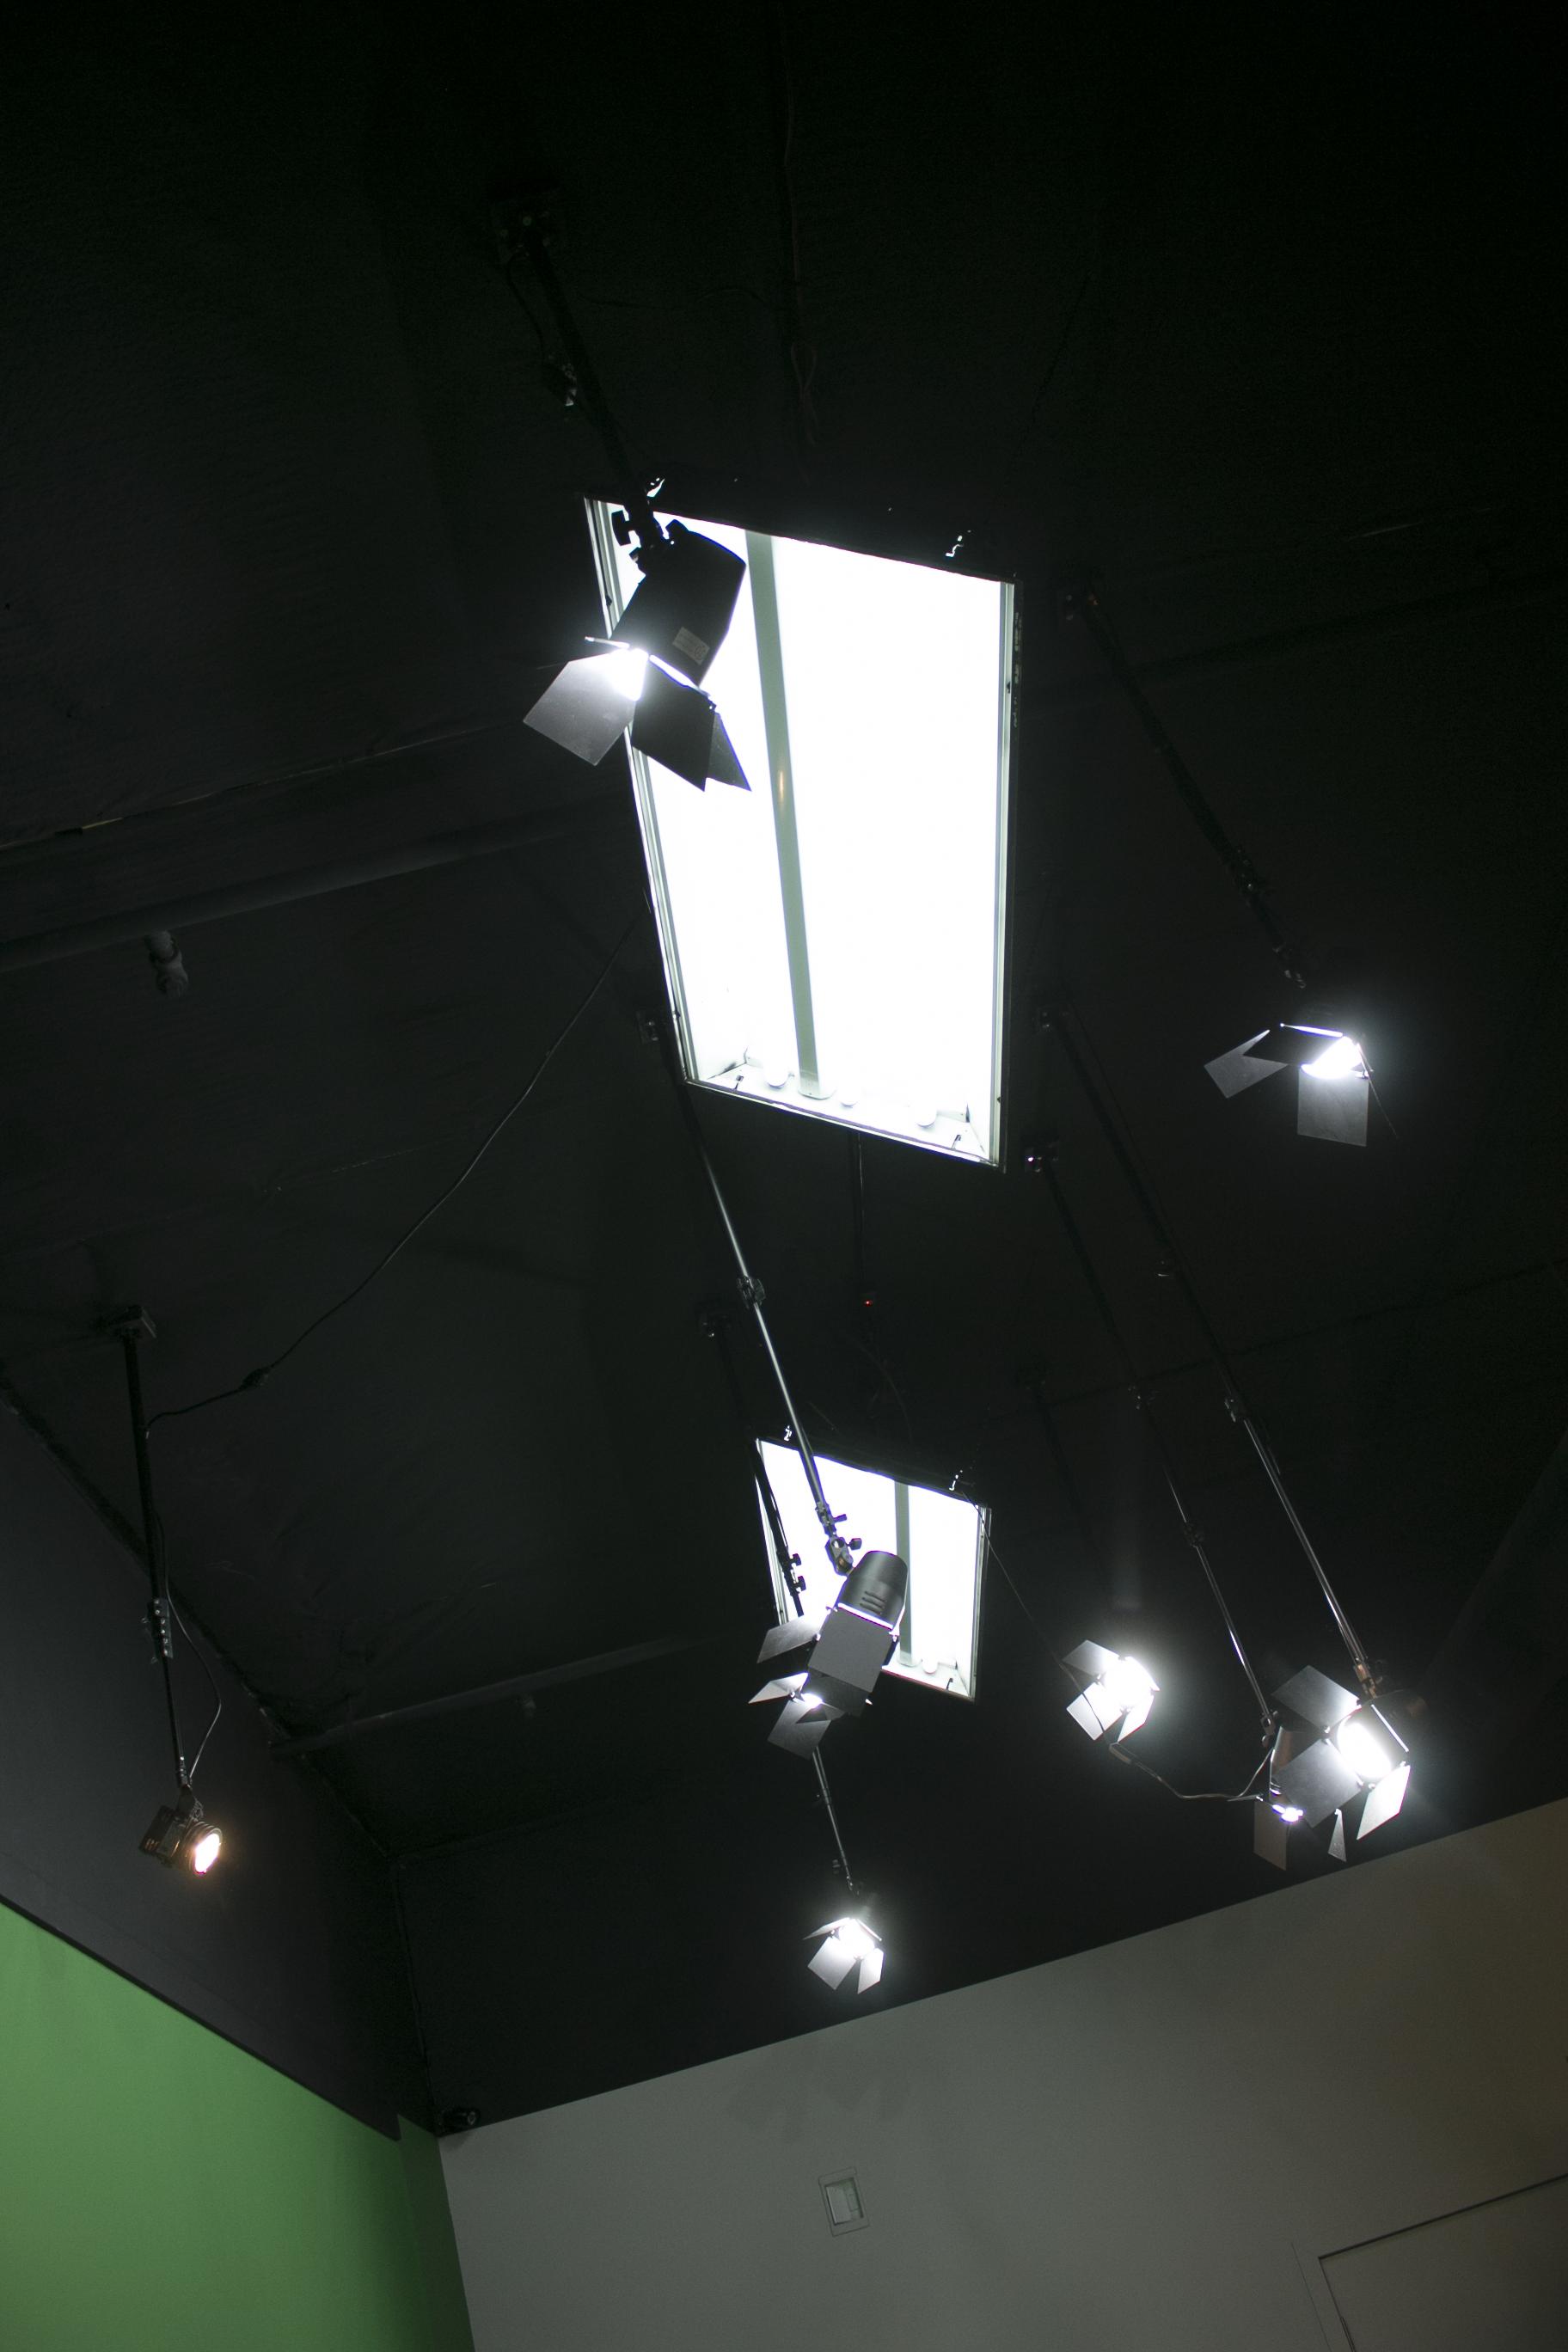 Lighting is pre-set